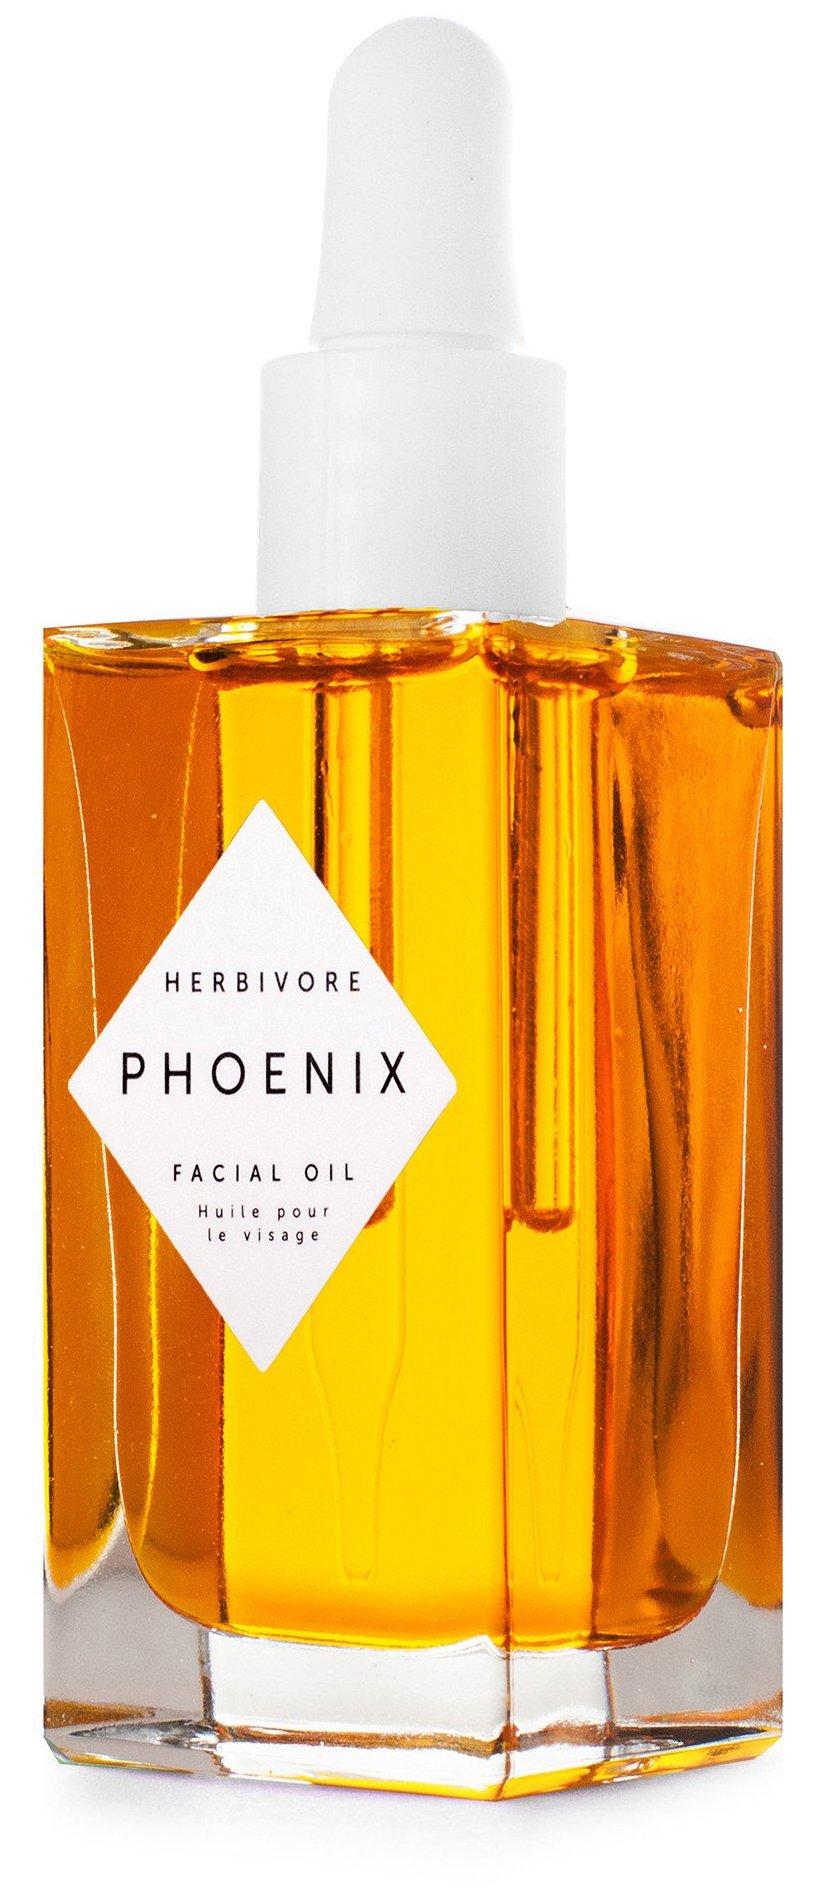 Herbivore Botanicals - All Natural Phoenix Facial Oil (1.7 oz / 50 ml) by Herbivore Botanicals (Image #1)